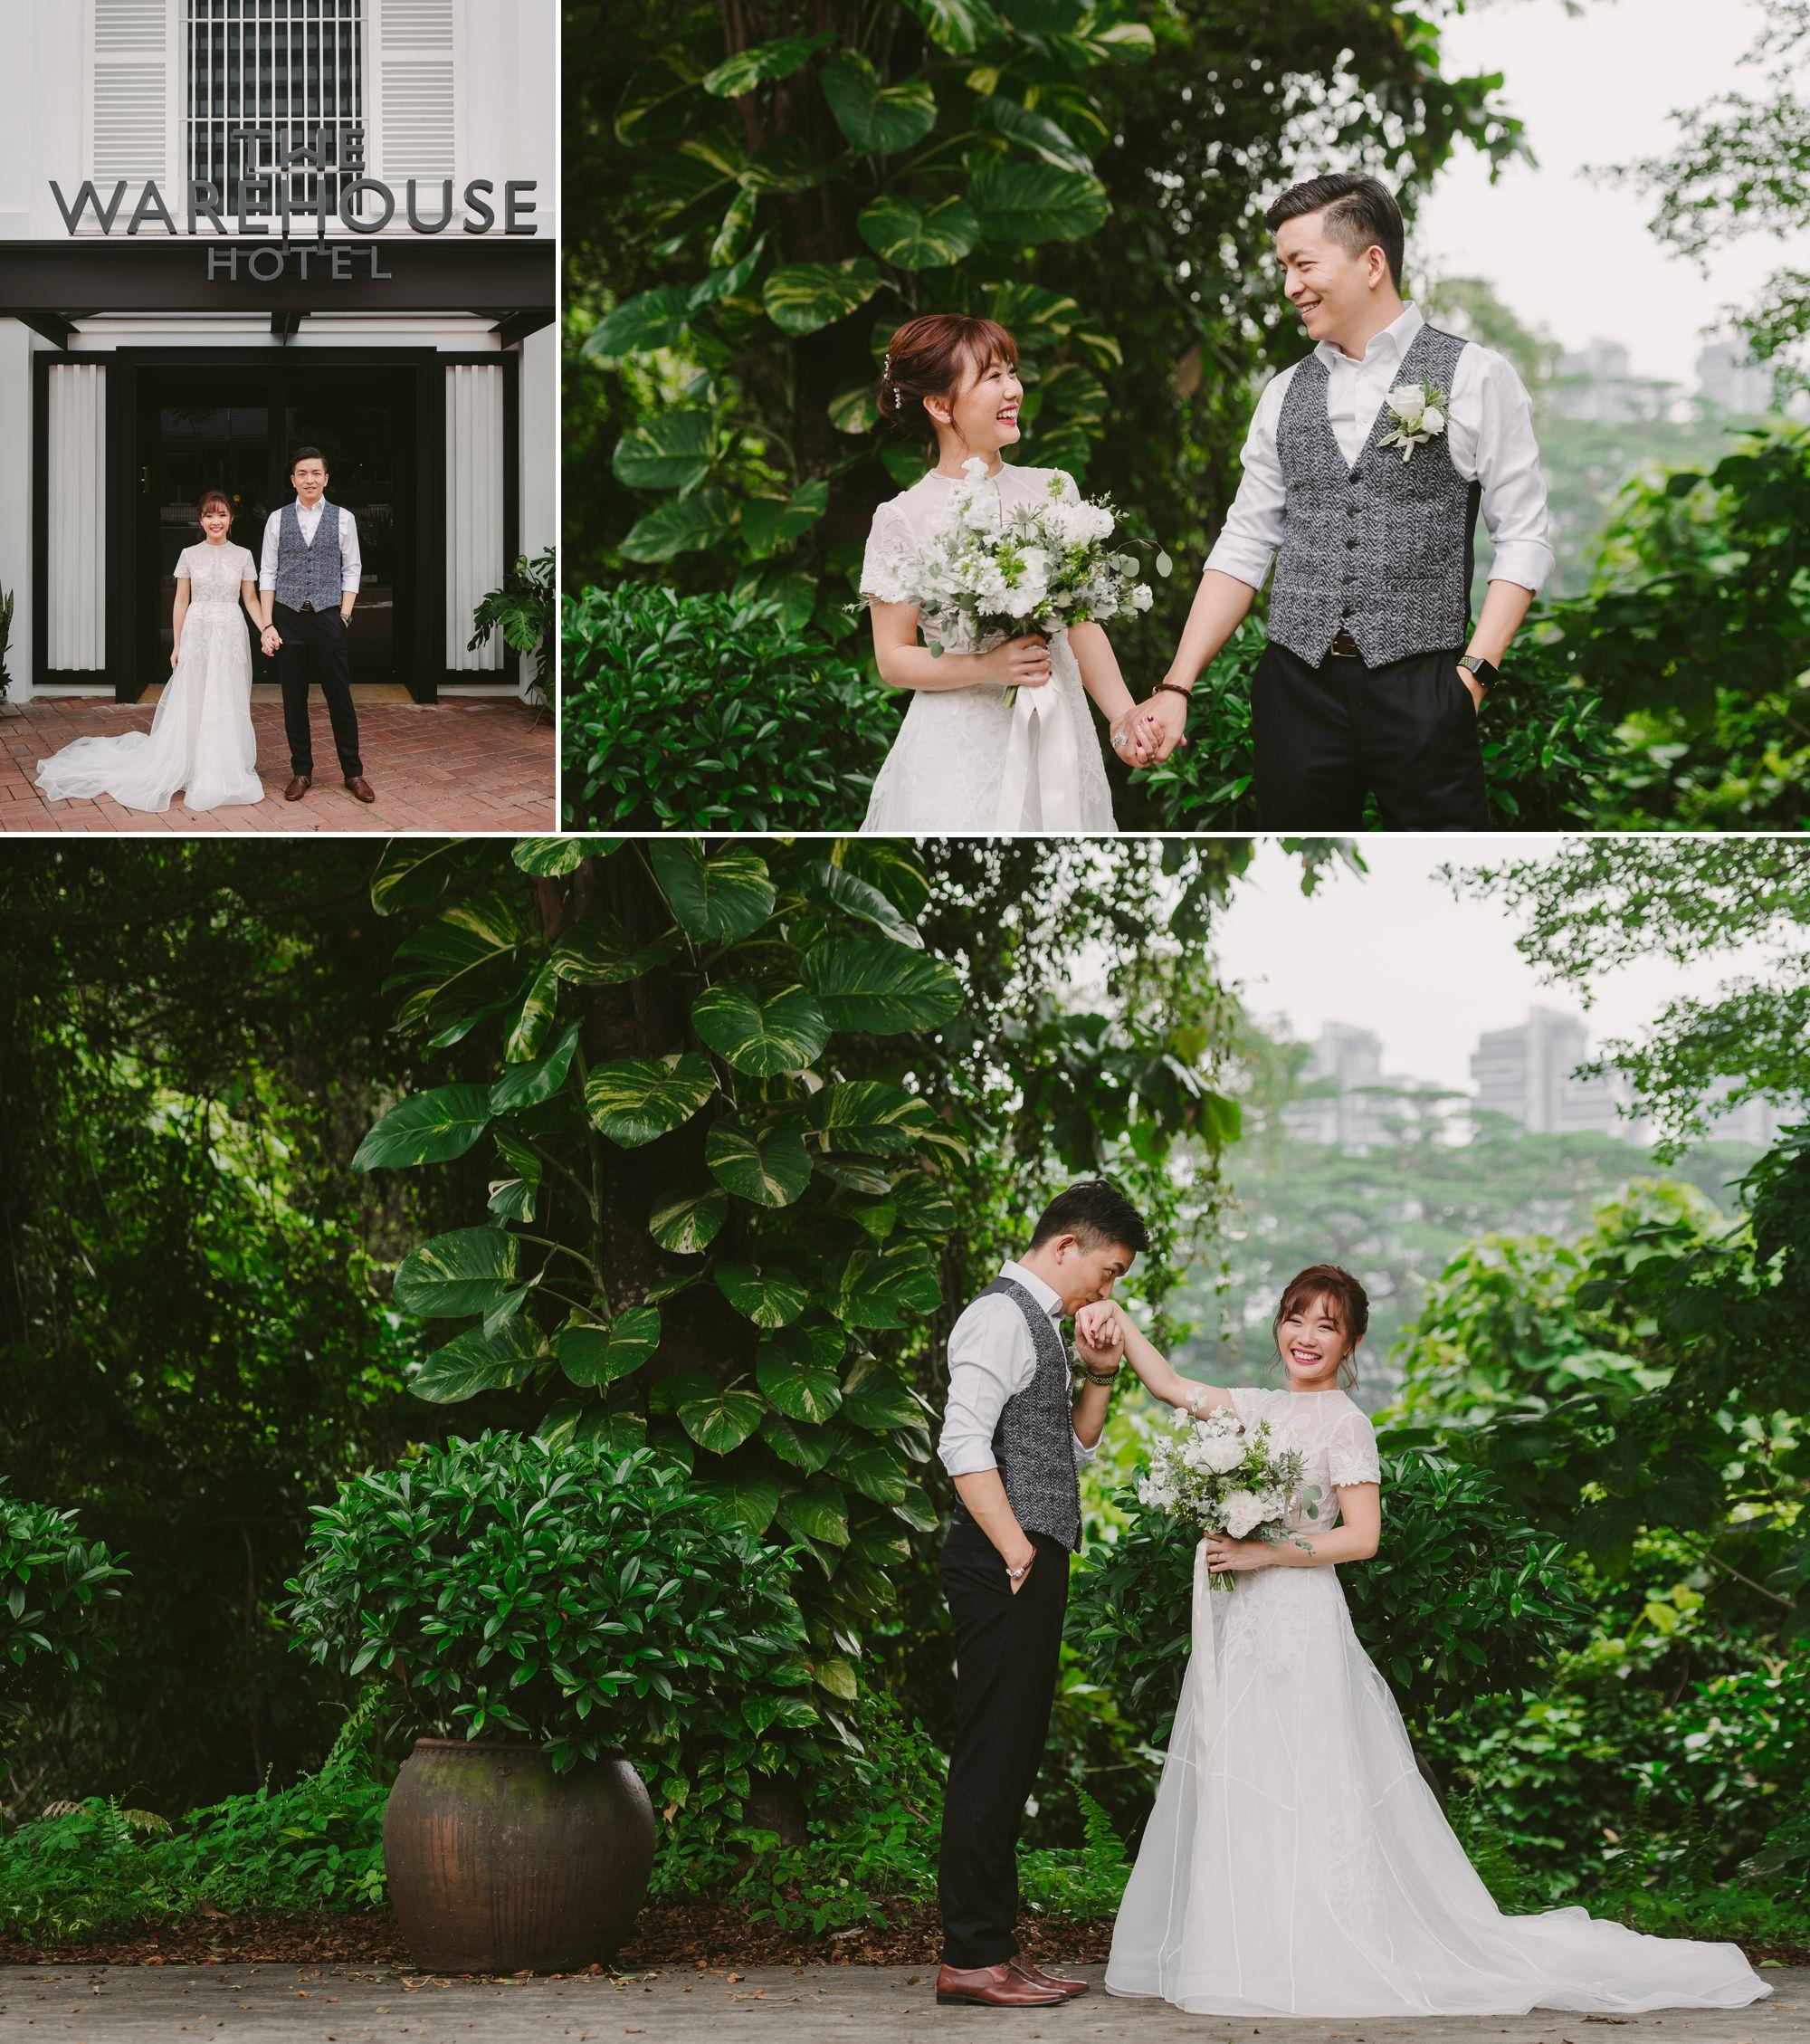 wedding_photography 5.jpg